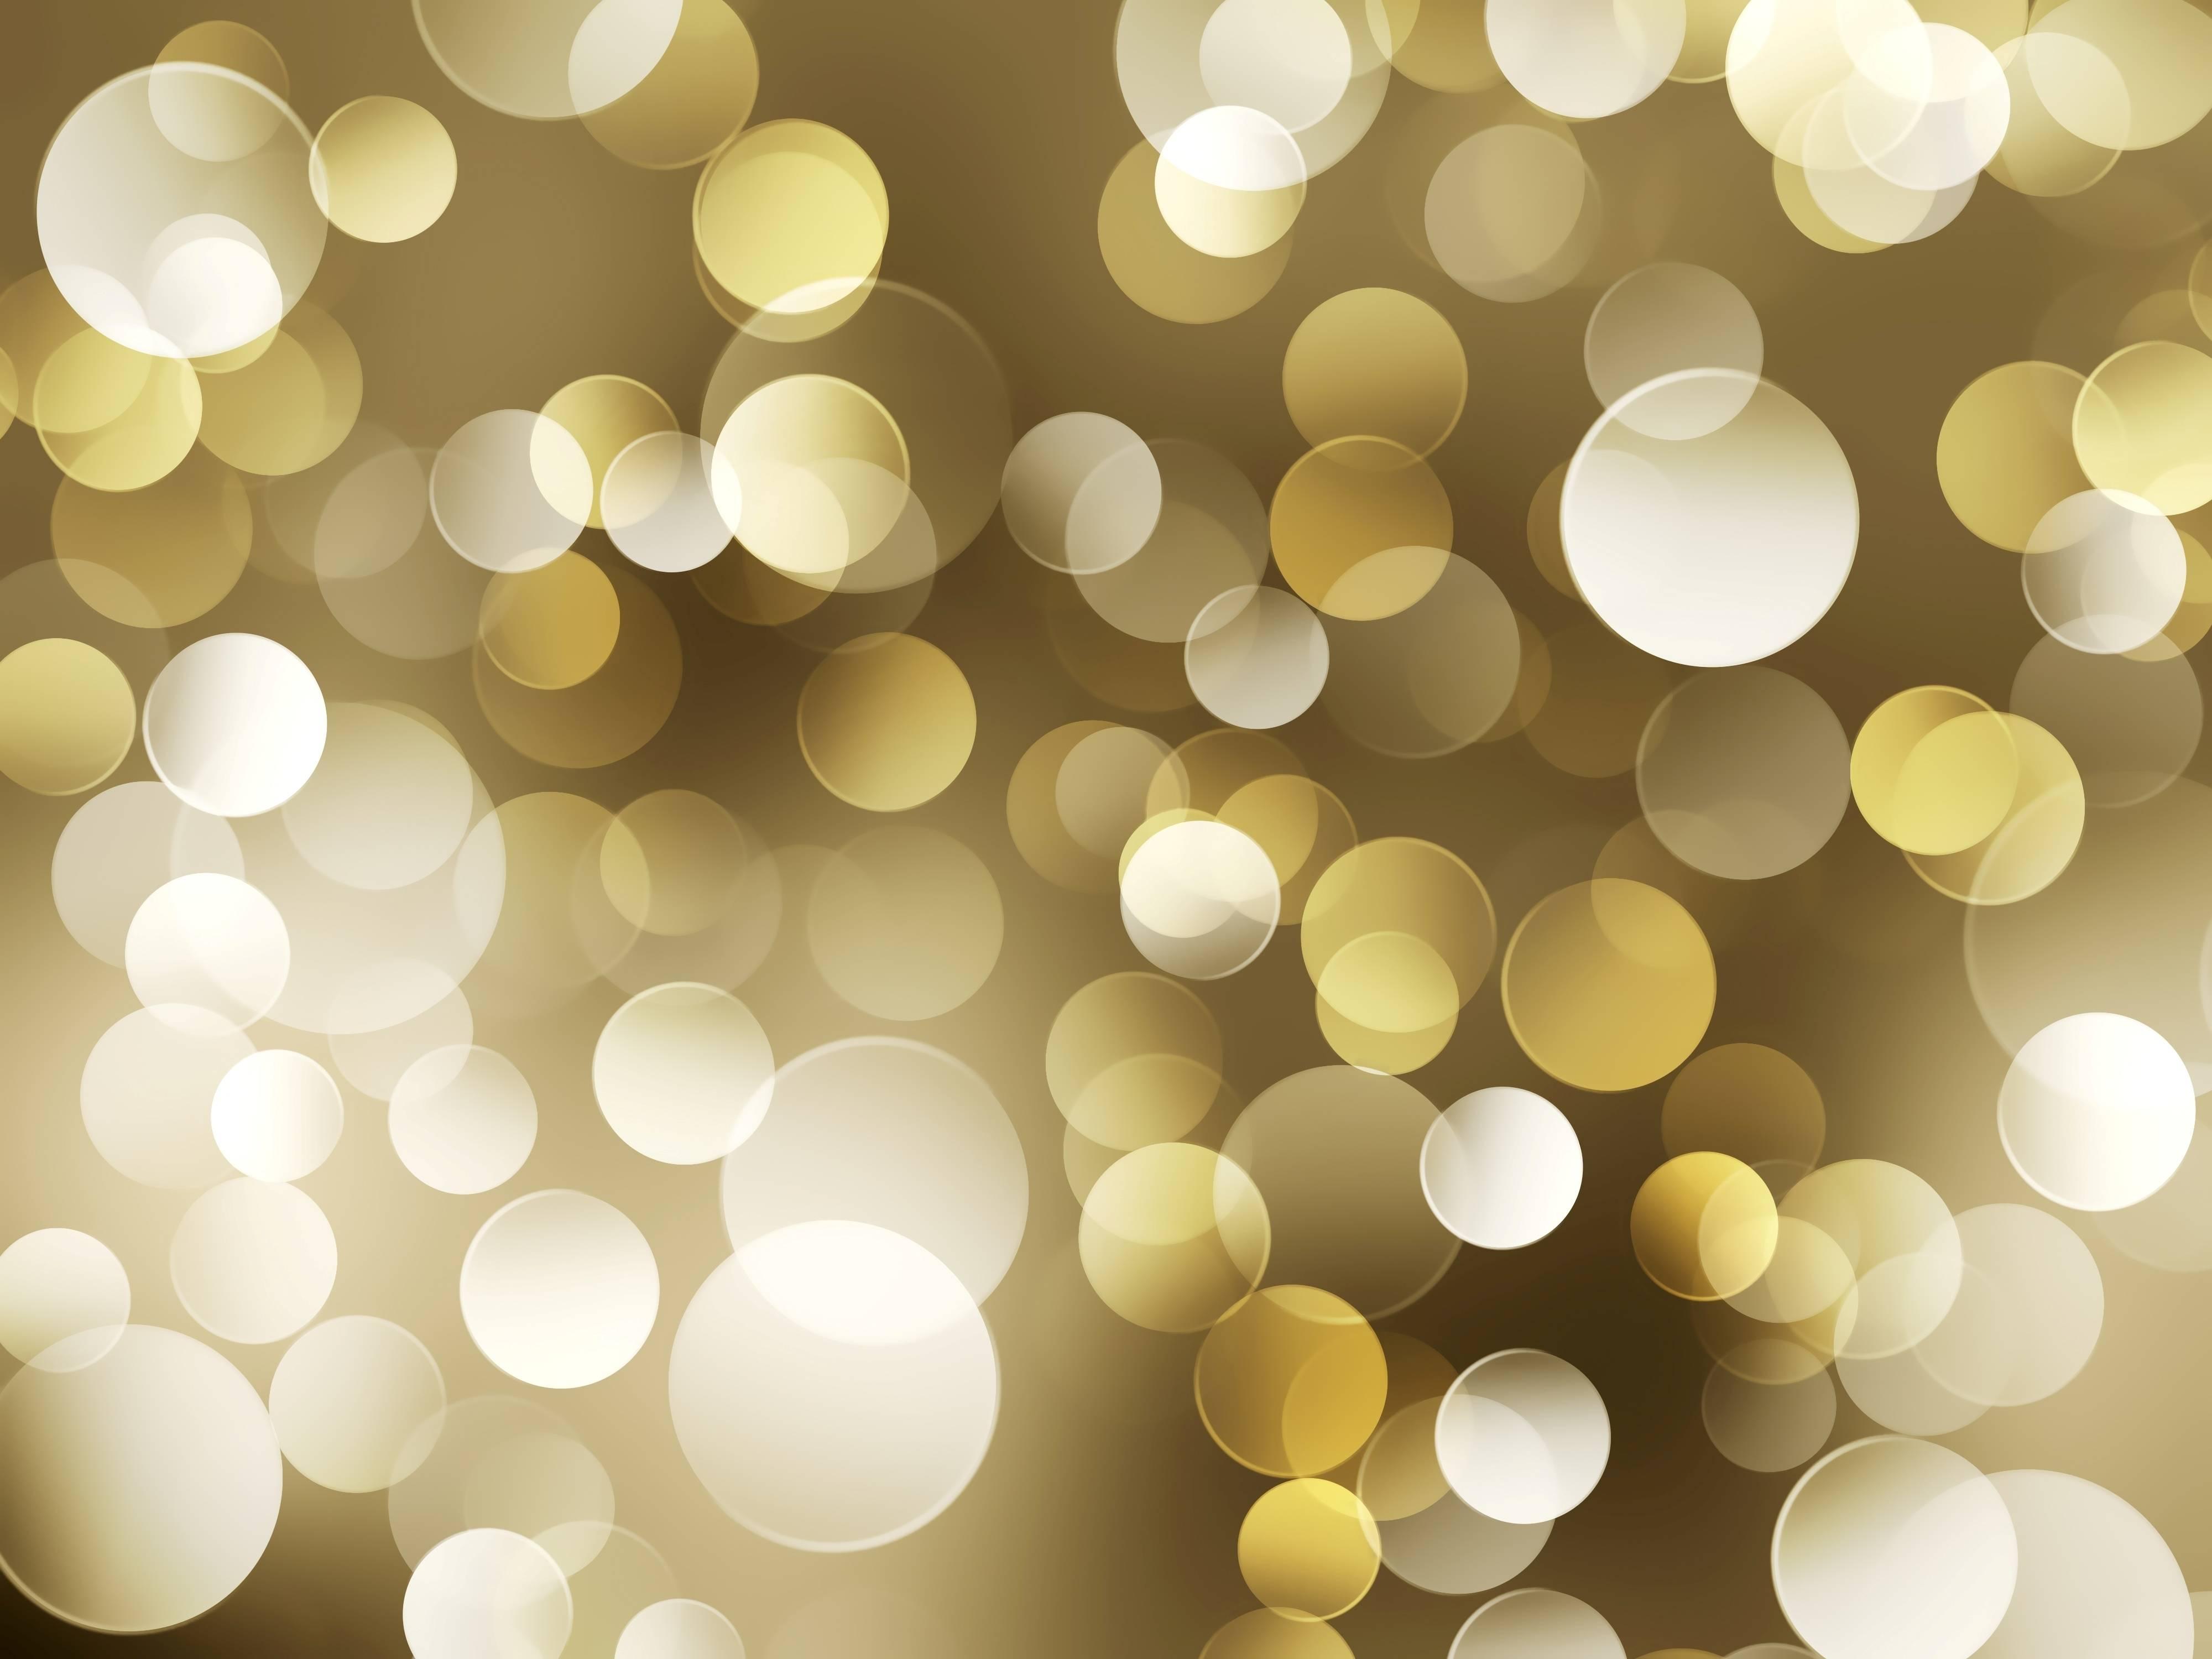 Light Gold Backgrounds